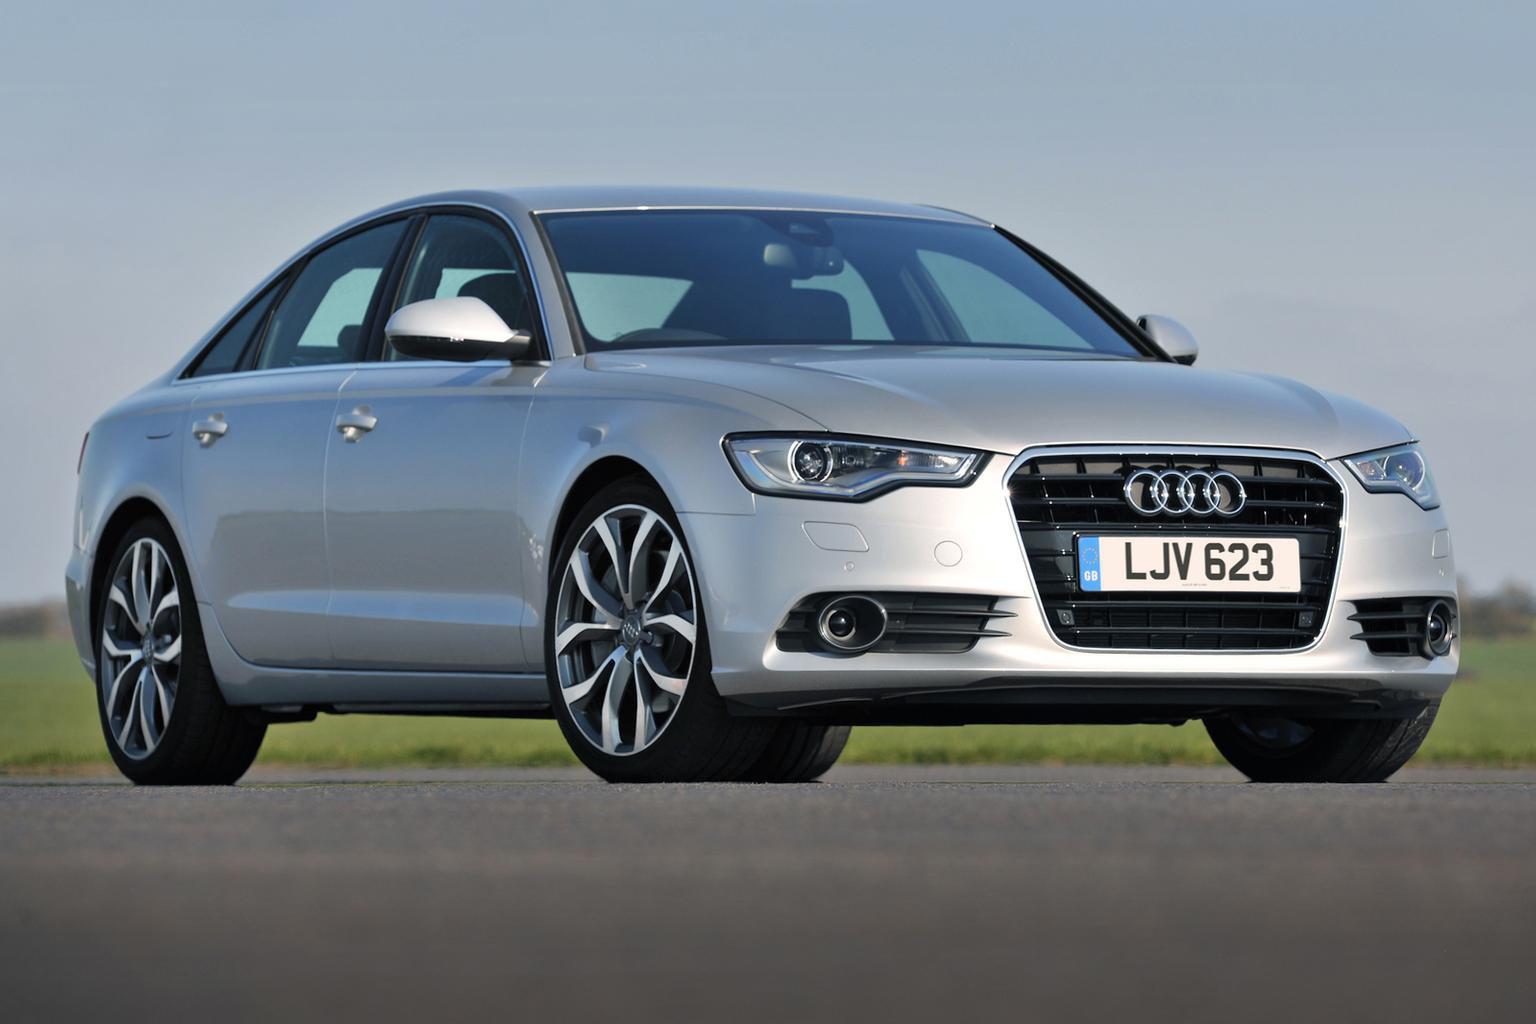 2014 Audi A6 Ultra 2.0 TDI review